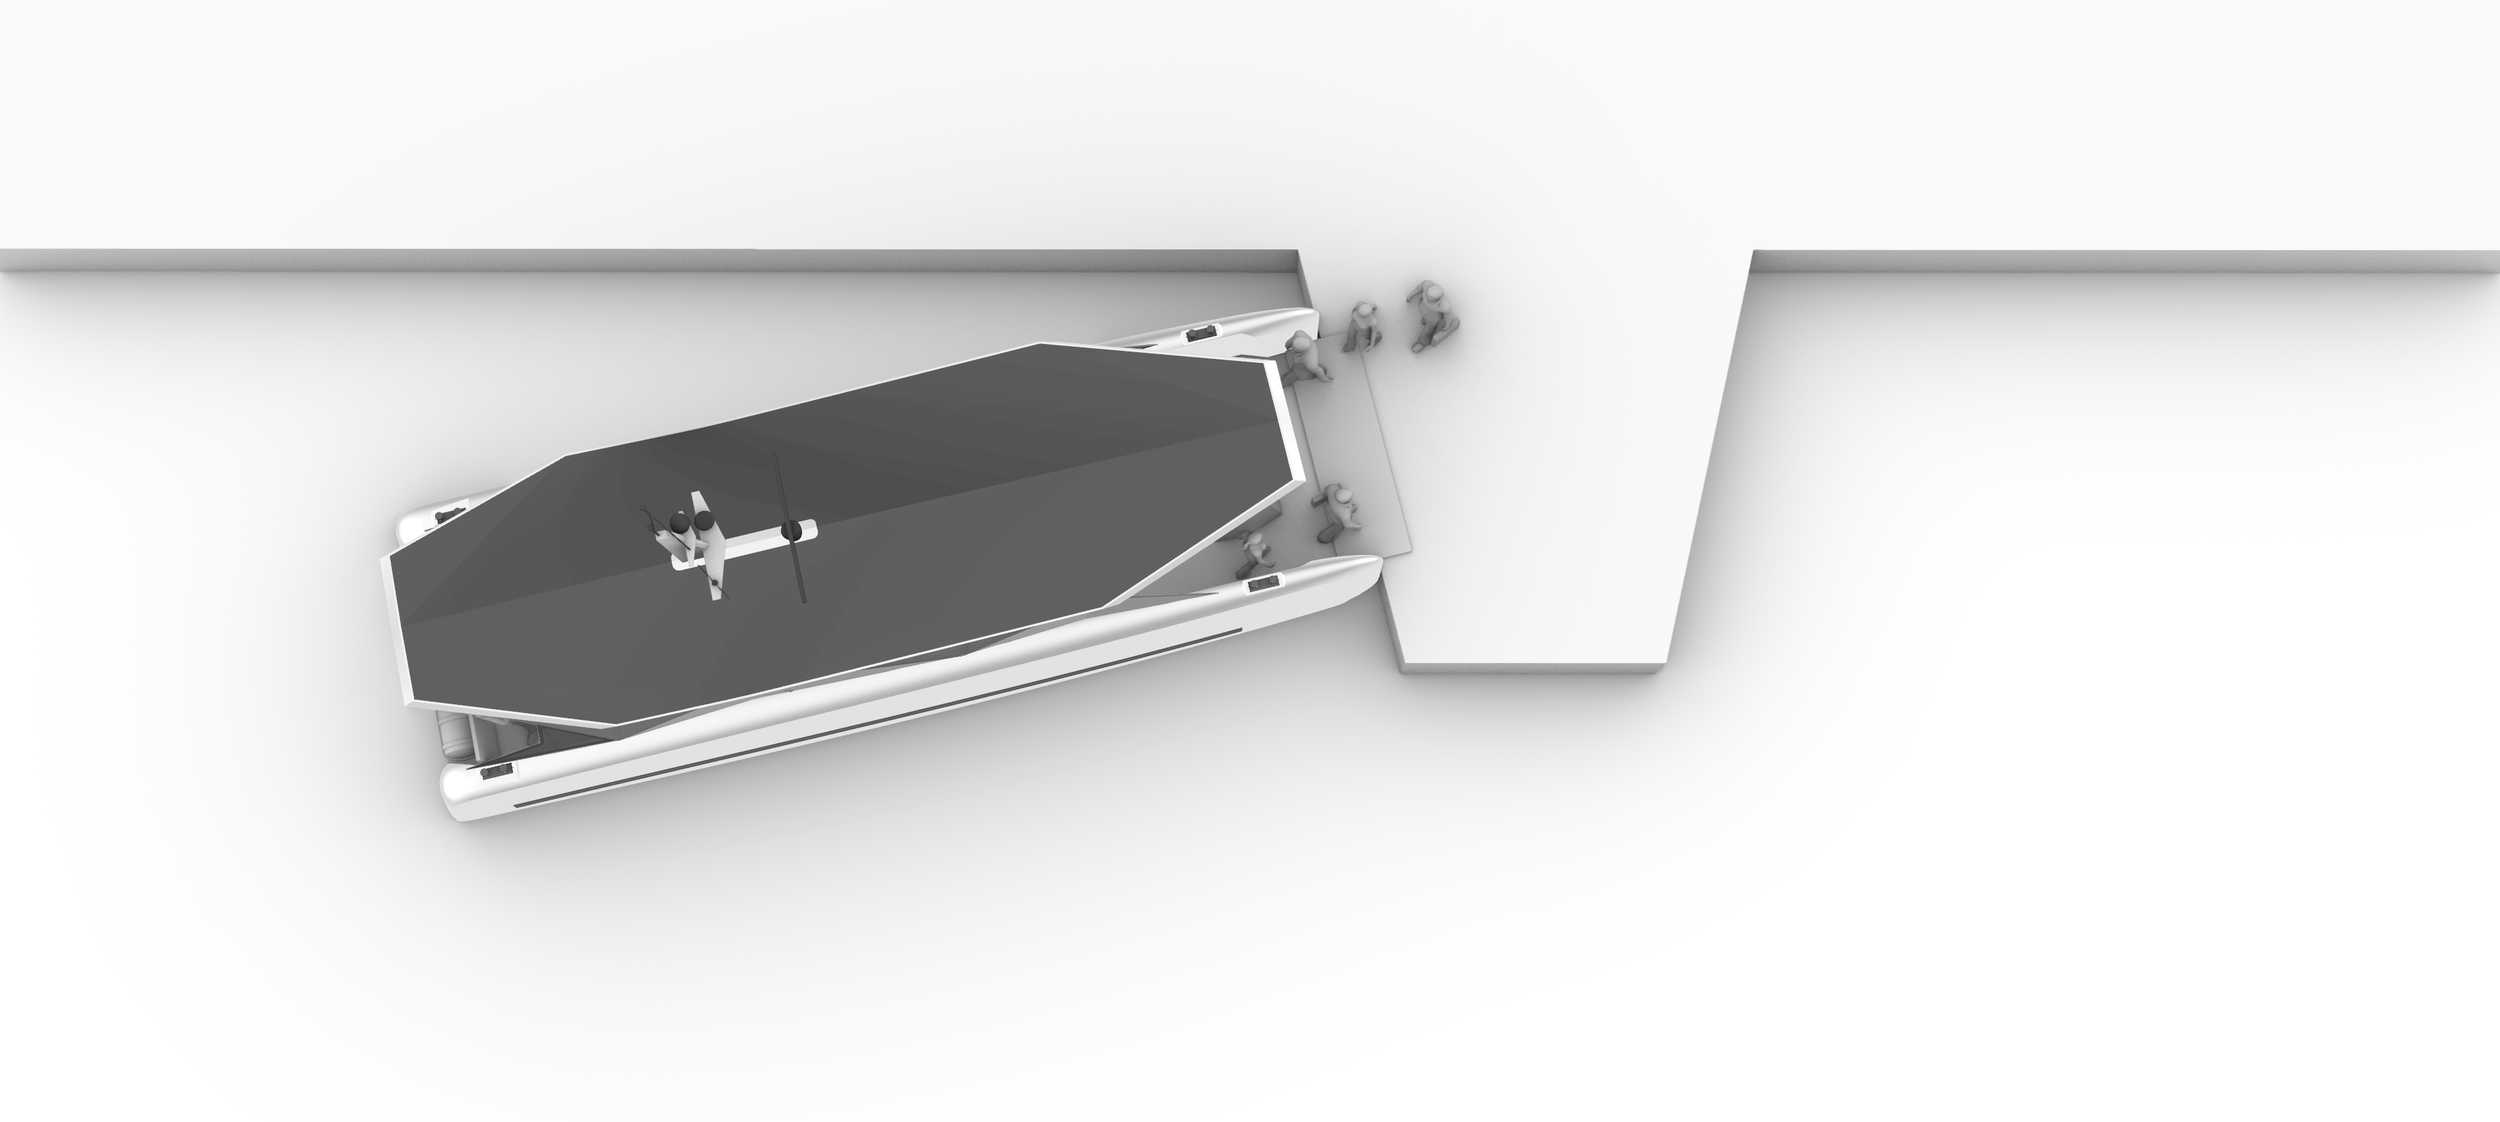 Solar_fuelled_boat_Pivot_Concept4.png